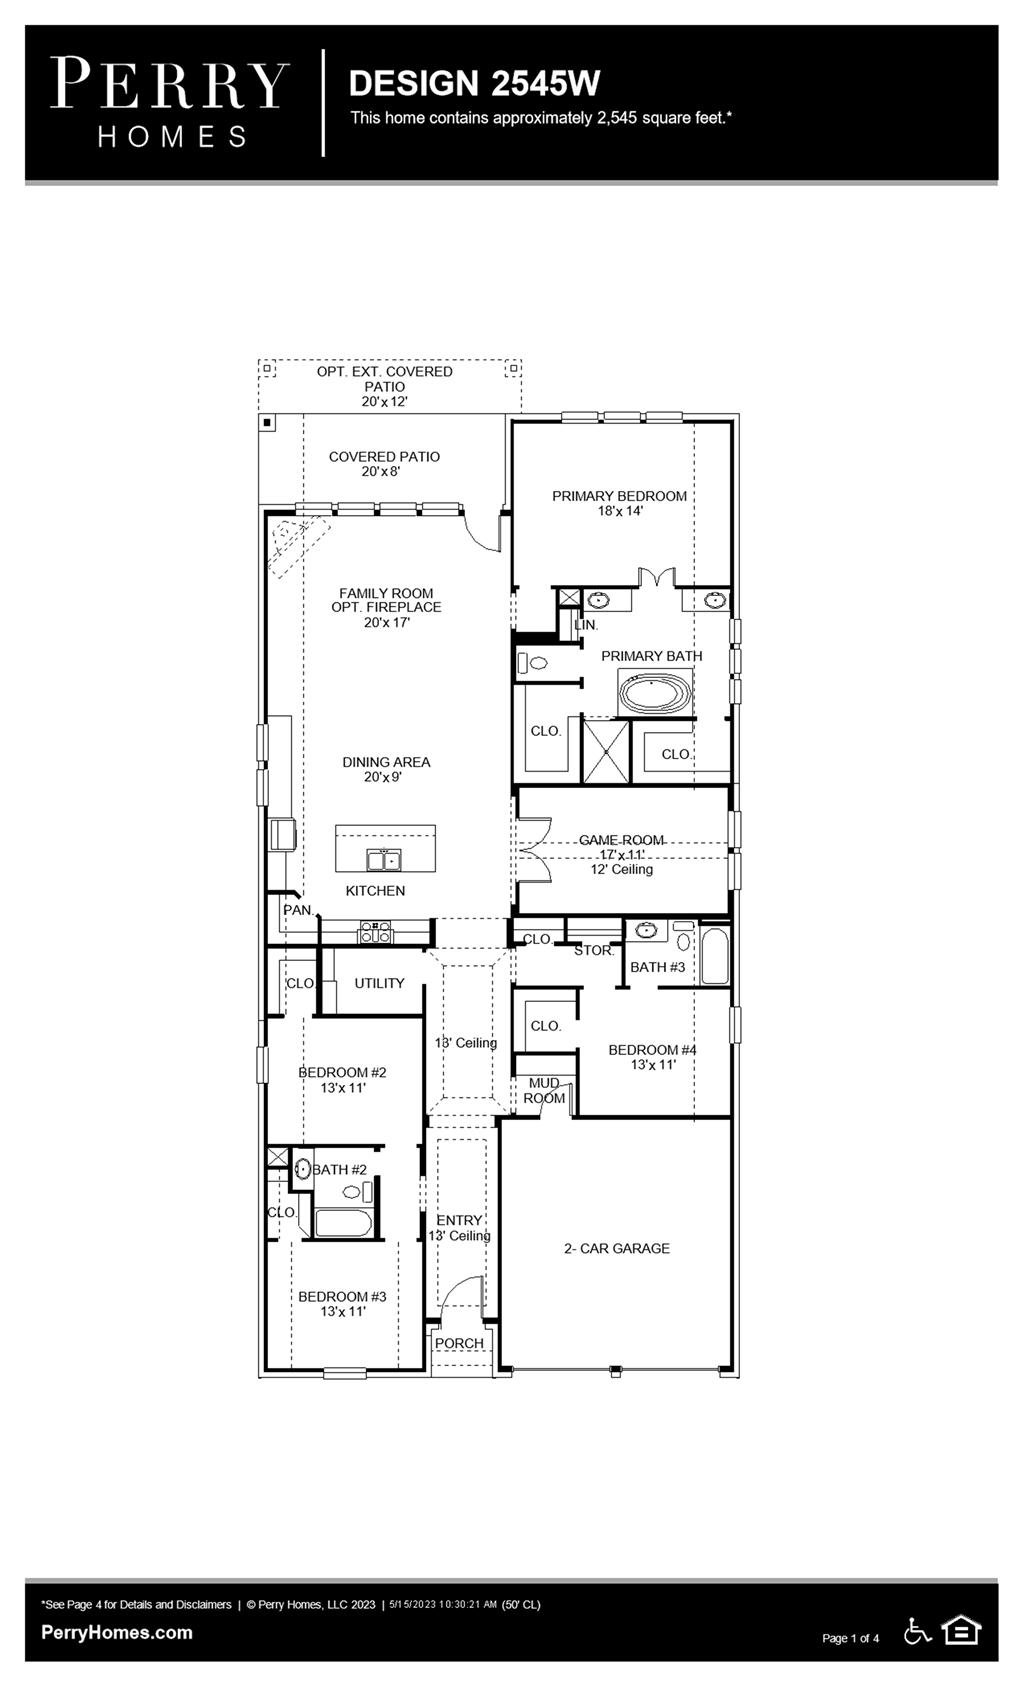 Floor Plan for 2545W